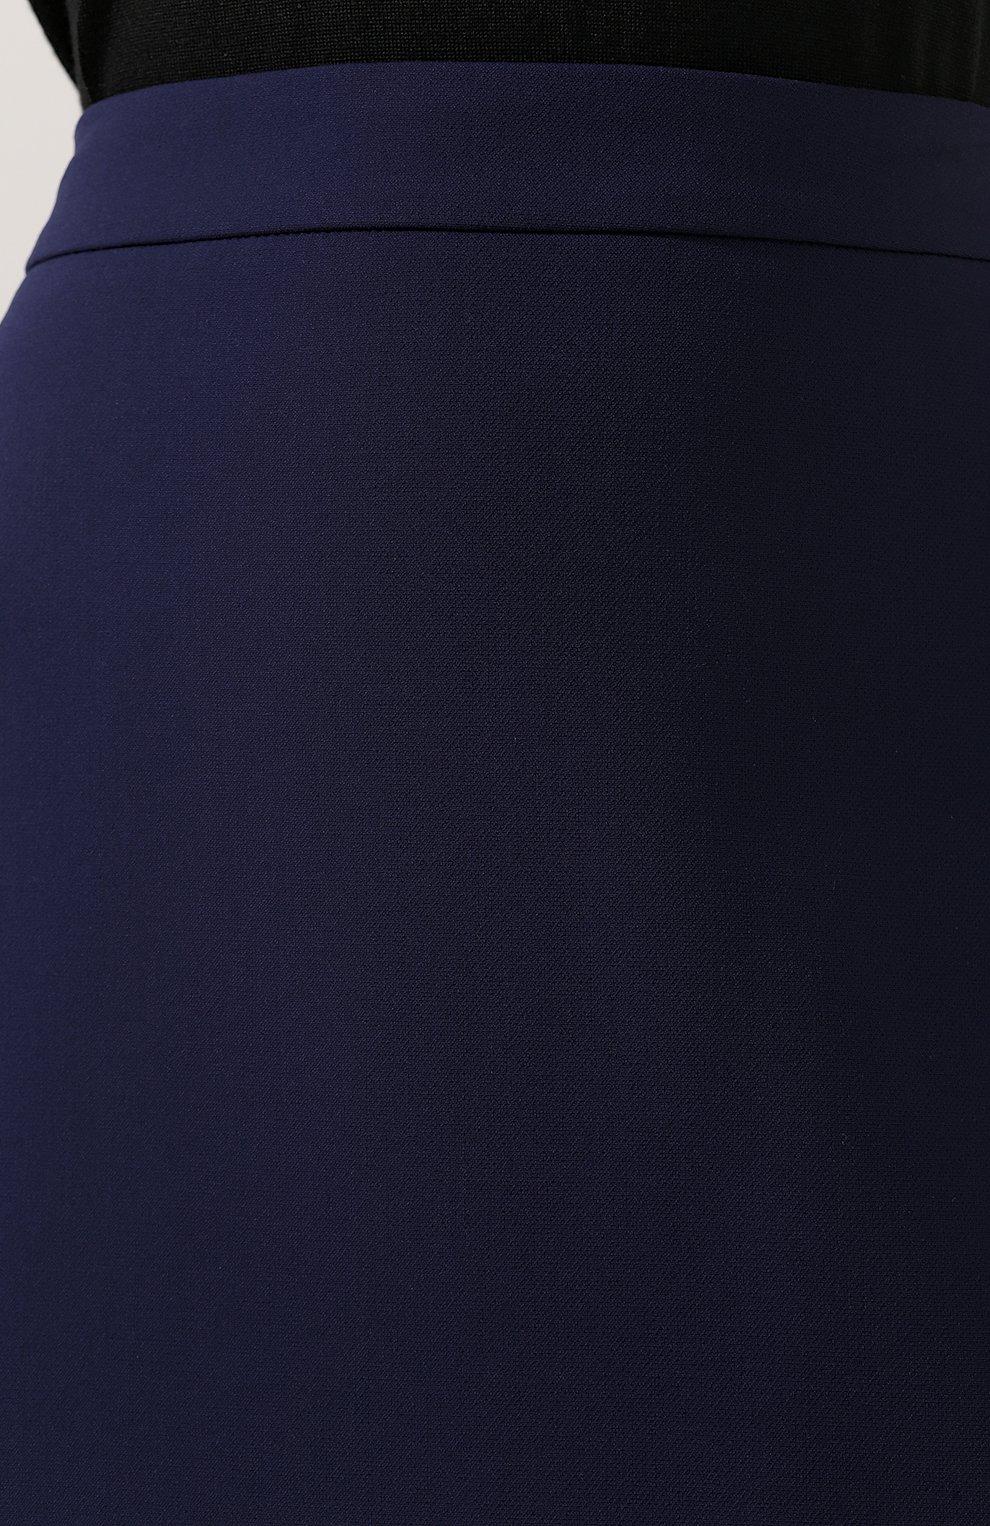 Женская юбка-карандаш BOSS синего цвета, арт. 50400538 | Фото 5